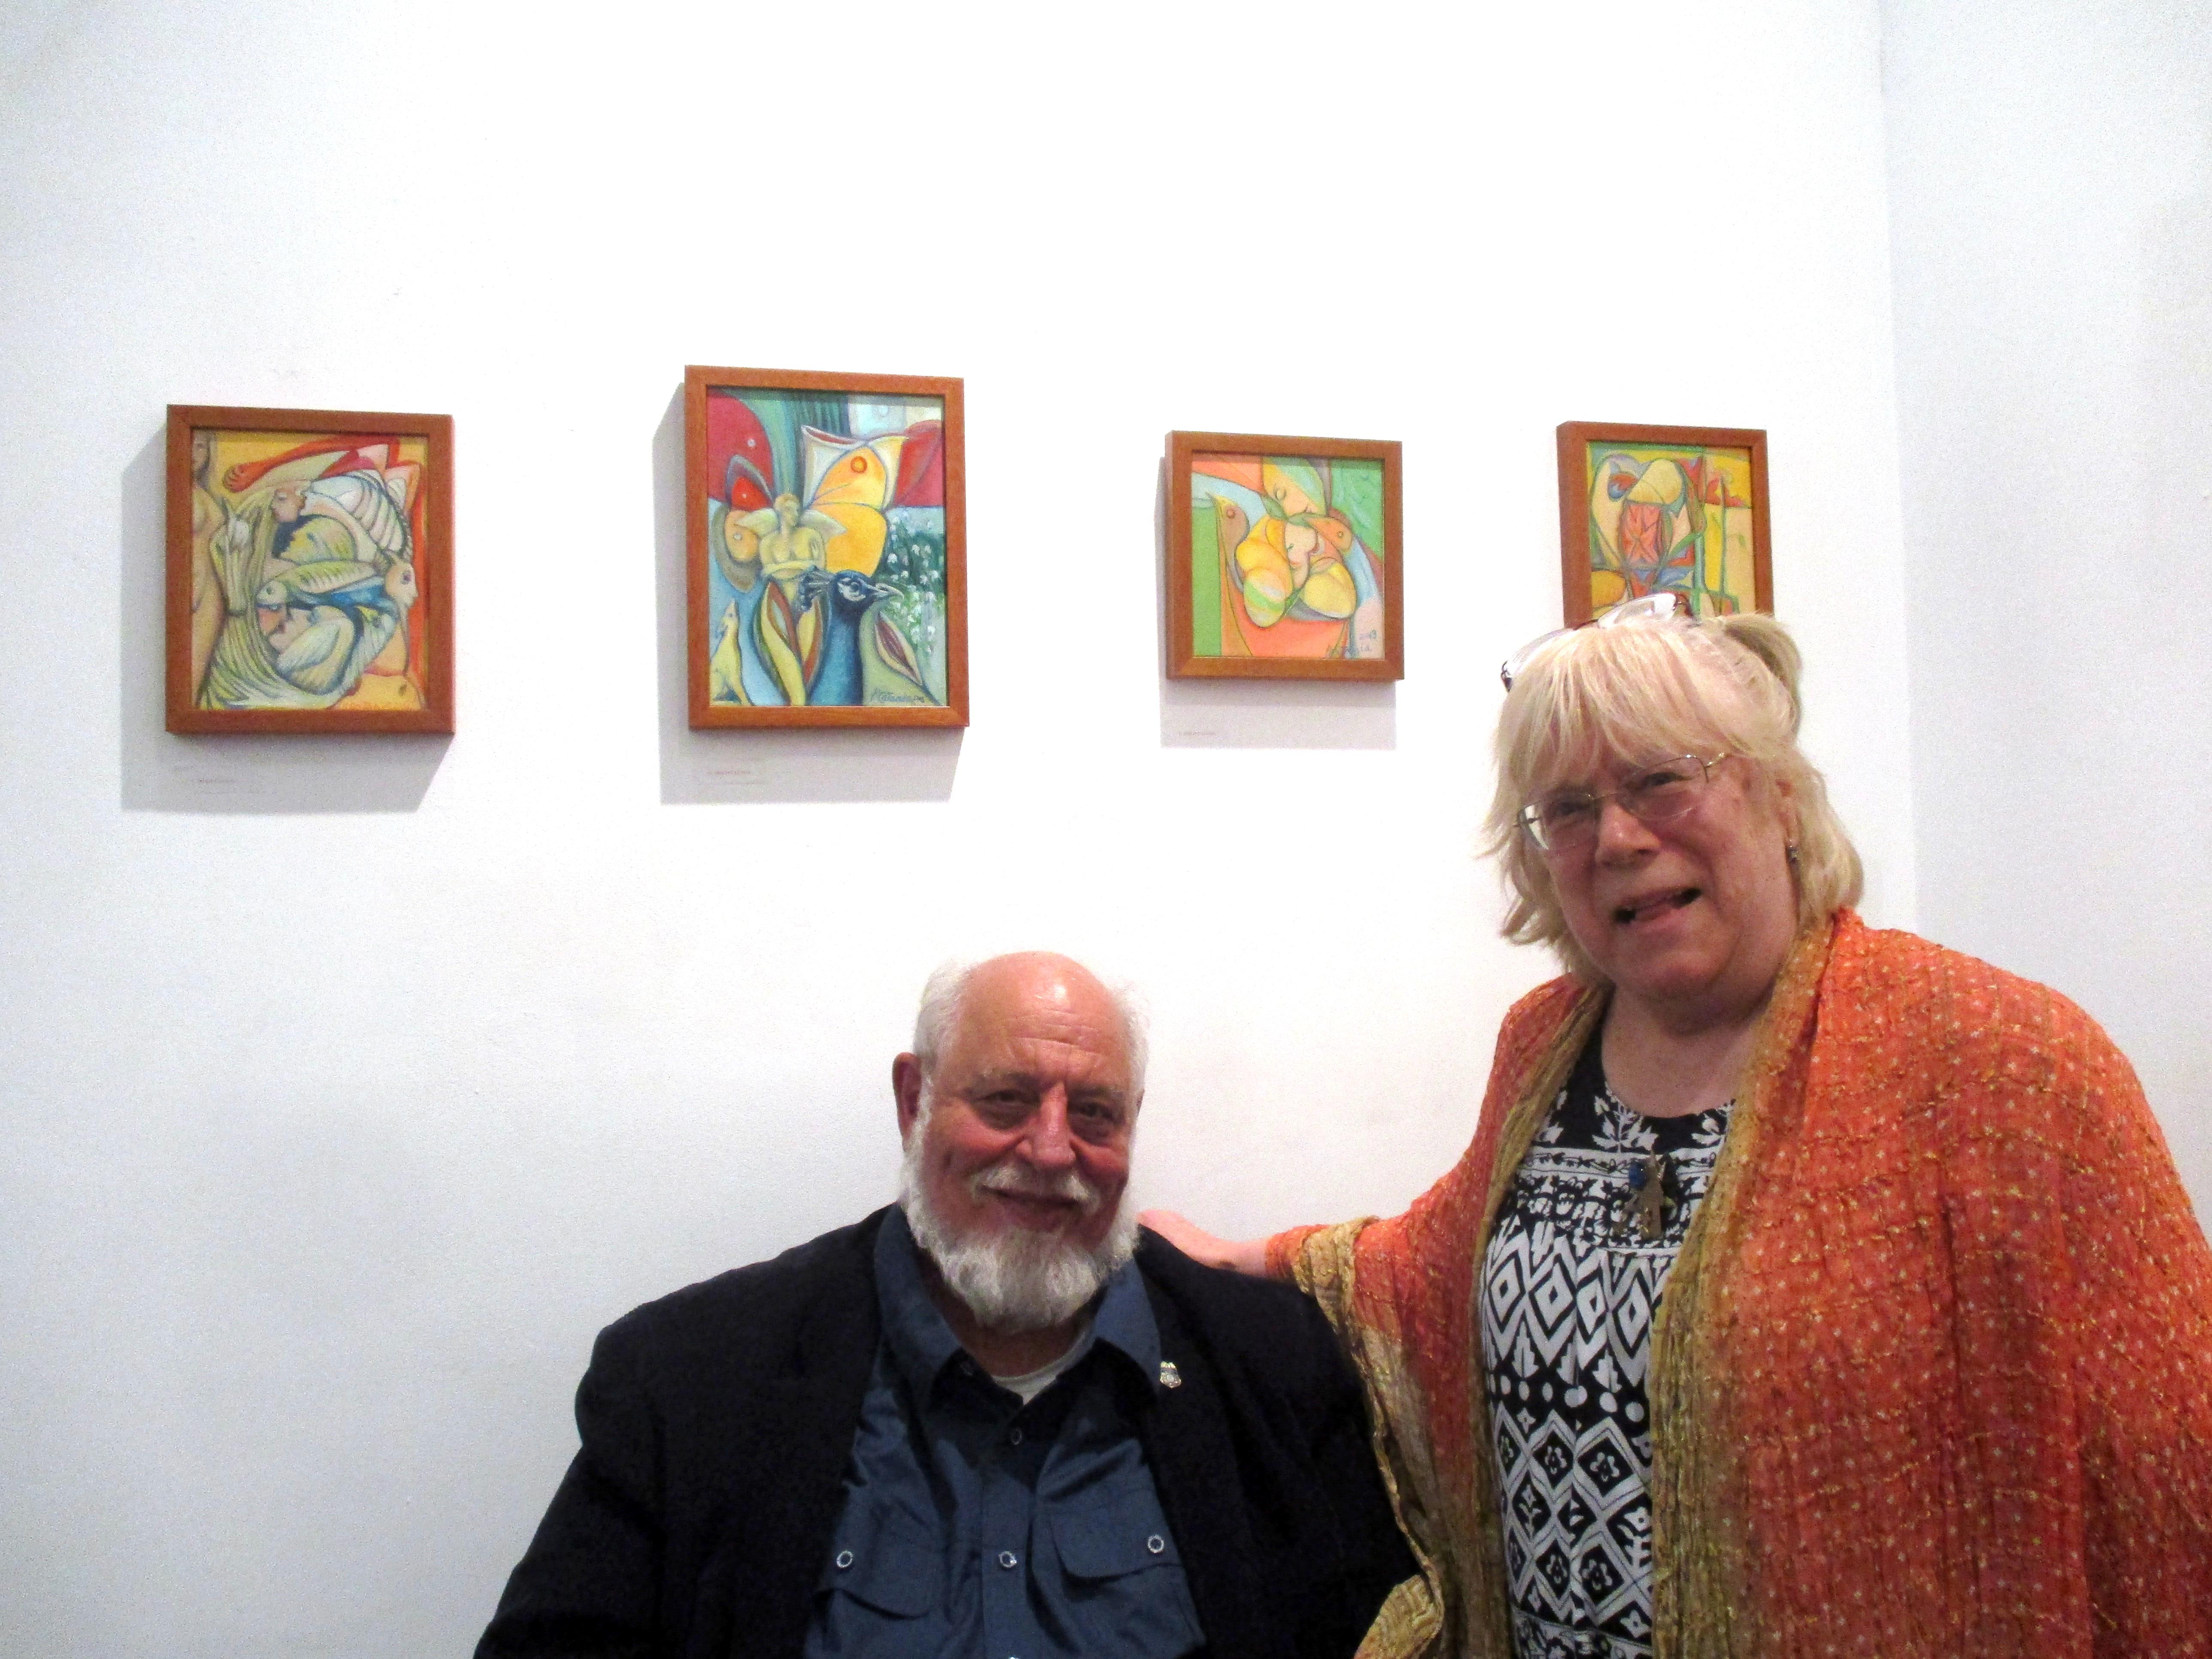 Philip and Karen Catania